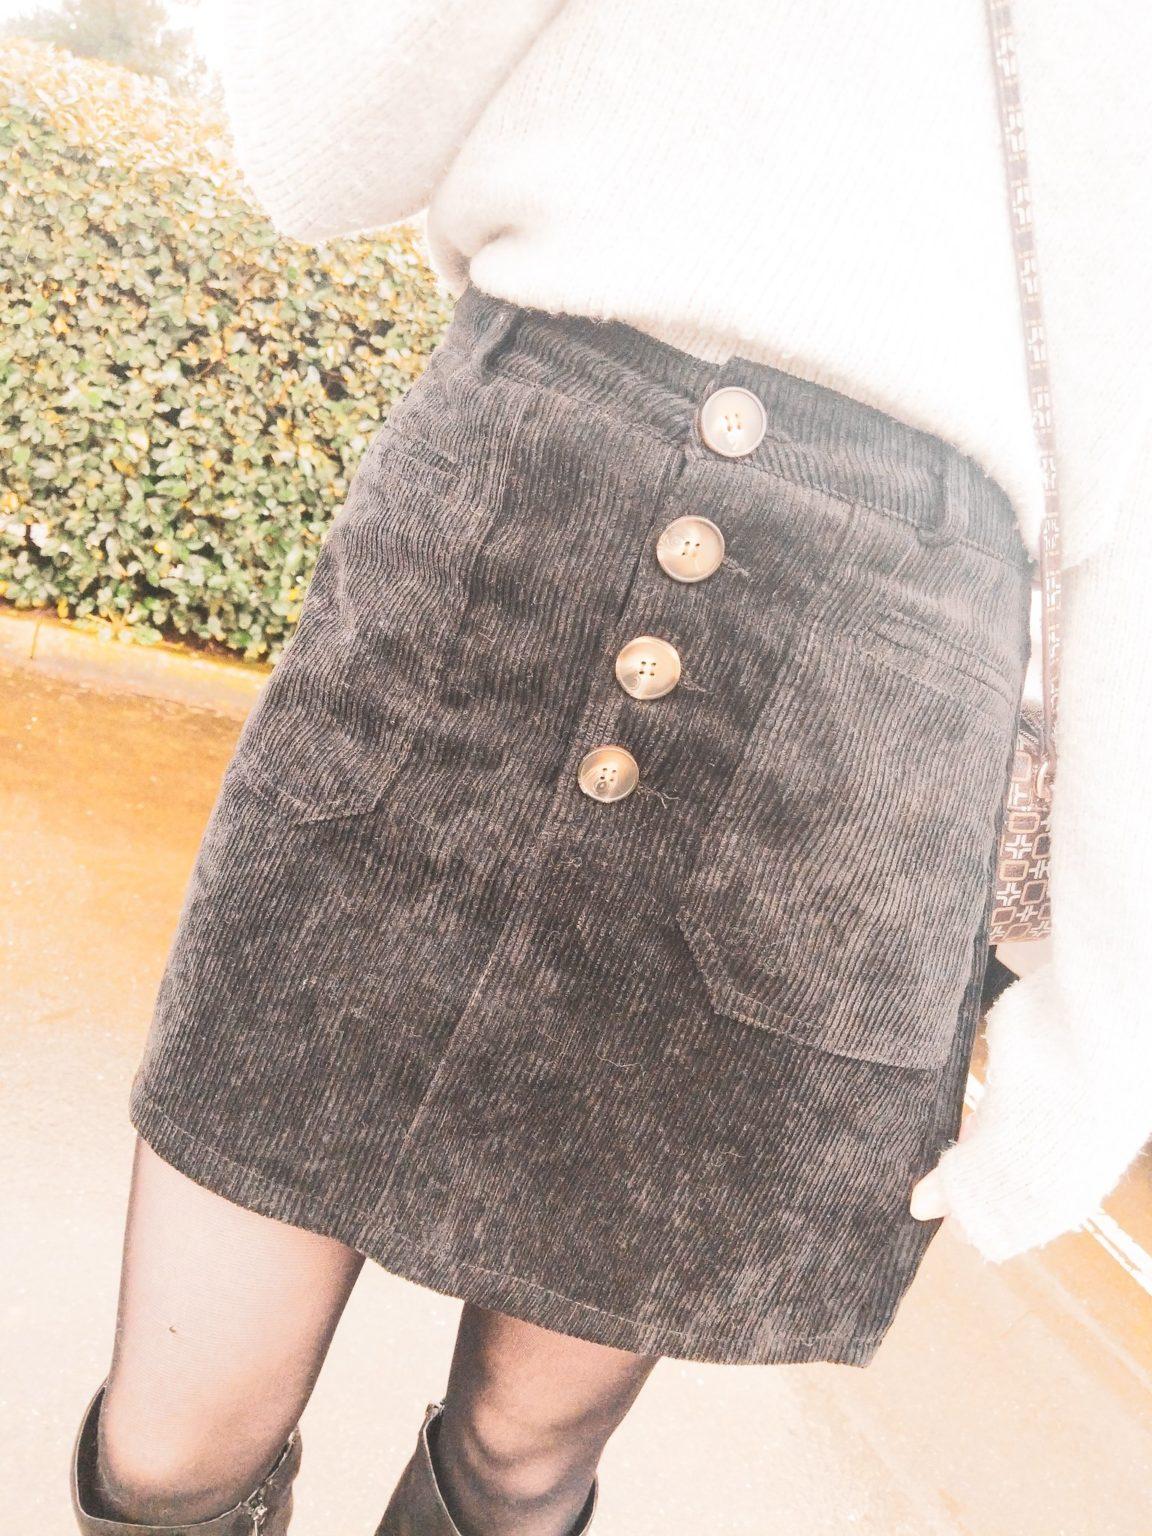 Corduroy Skirt and Knee High Boots